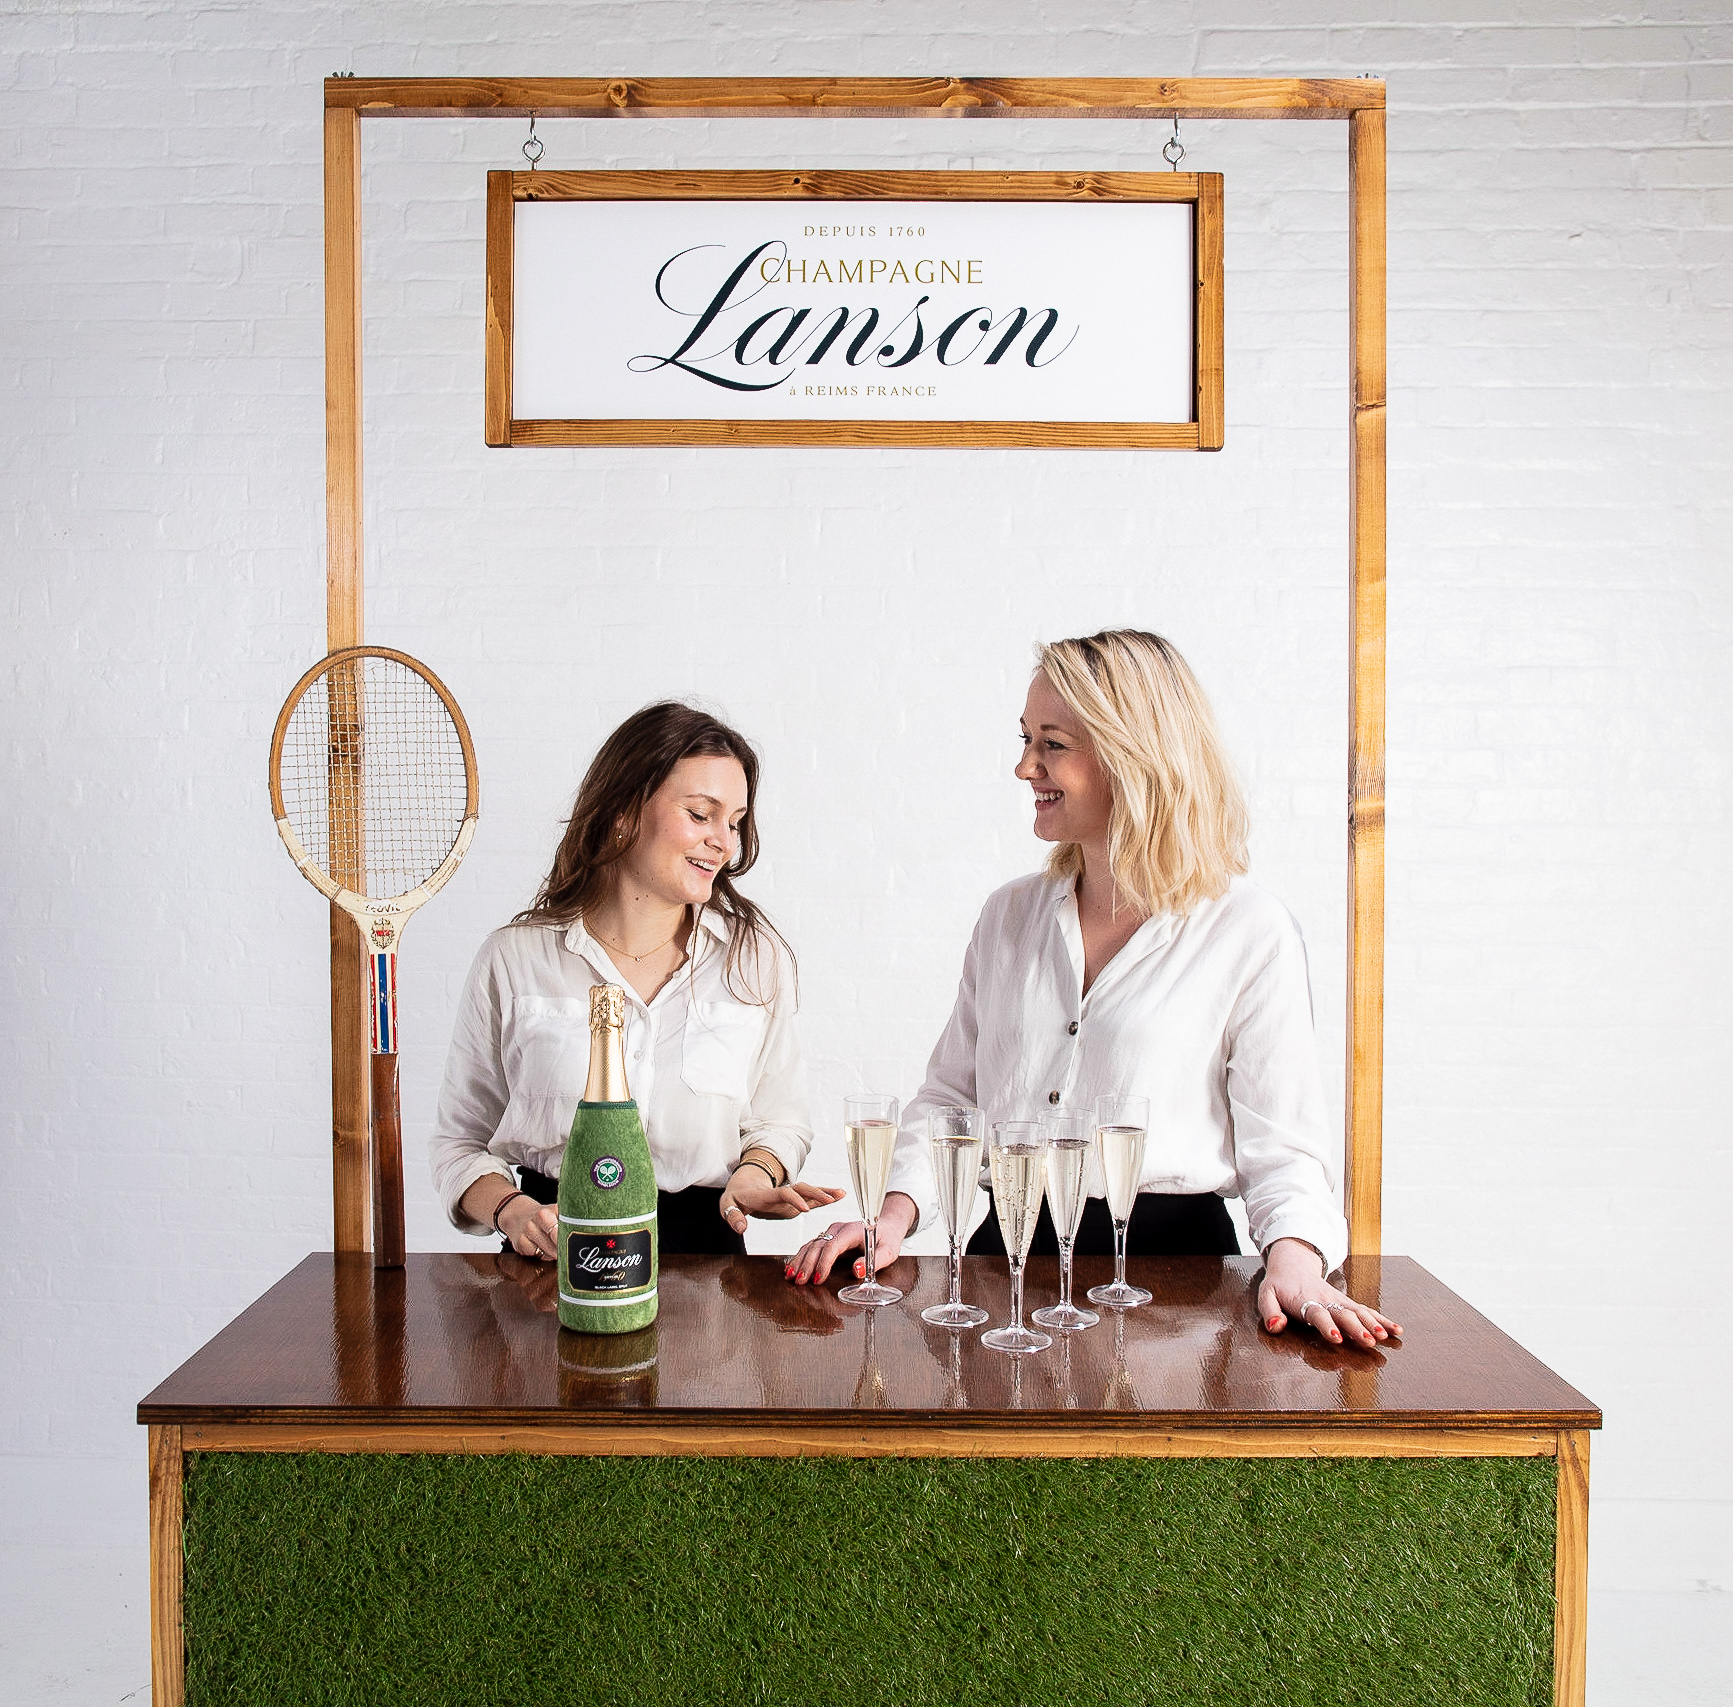 Grass Bar Champagne.jpg